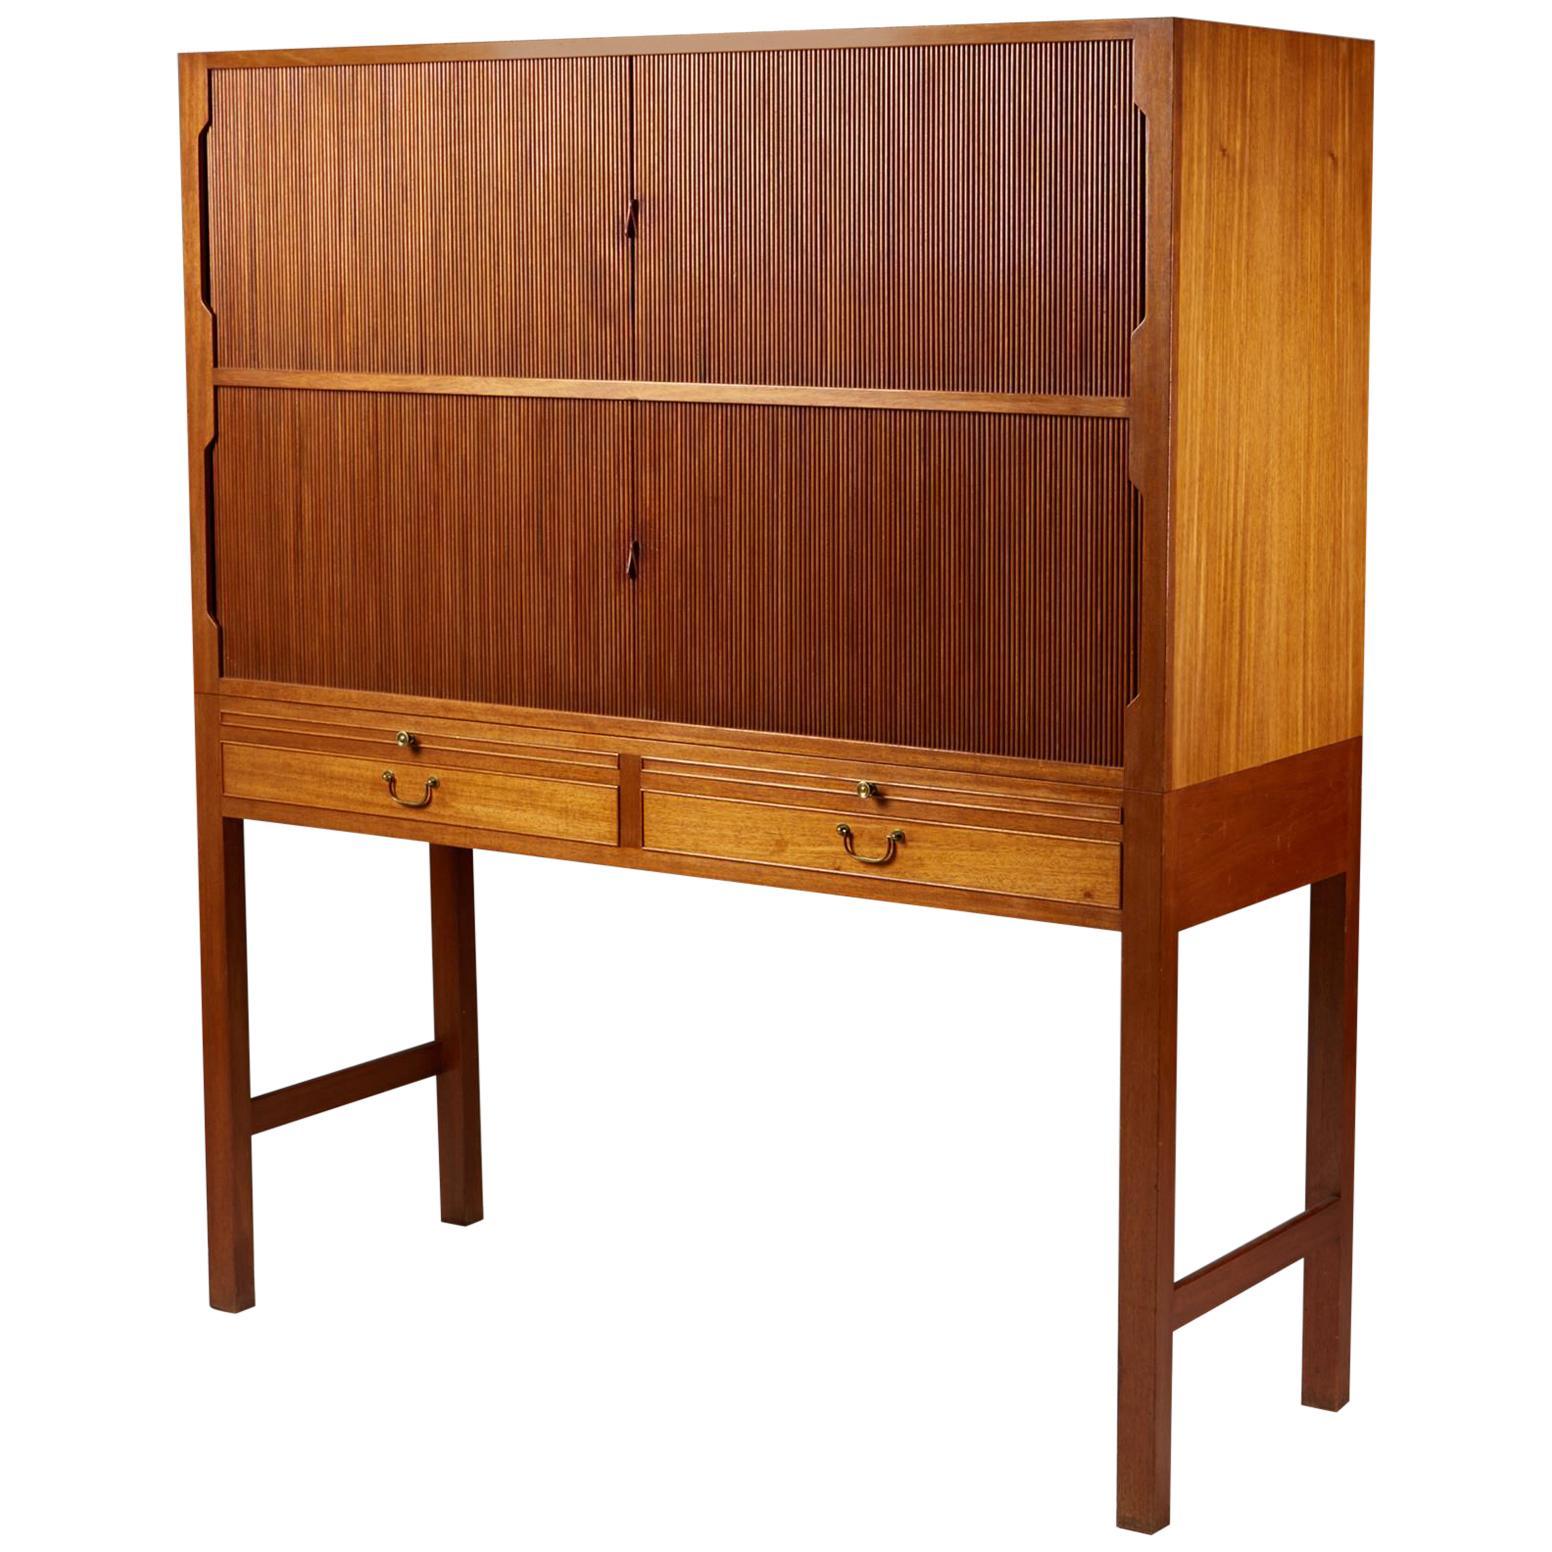 Cabinet, Designed by Ole Wanscher for A. J. Iversen, Denmark, 1947